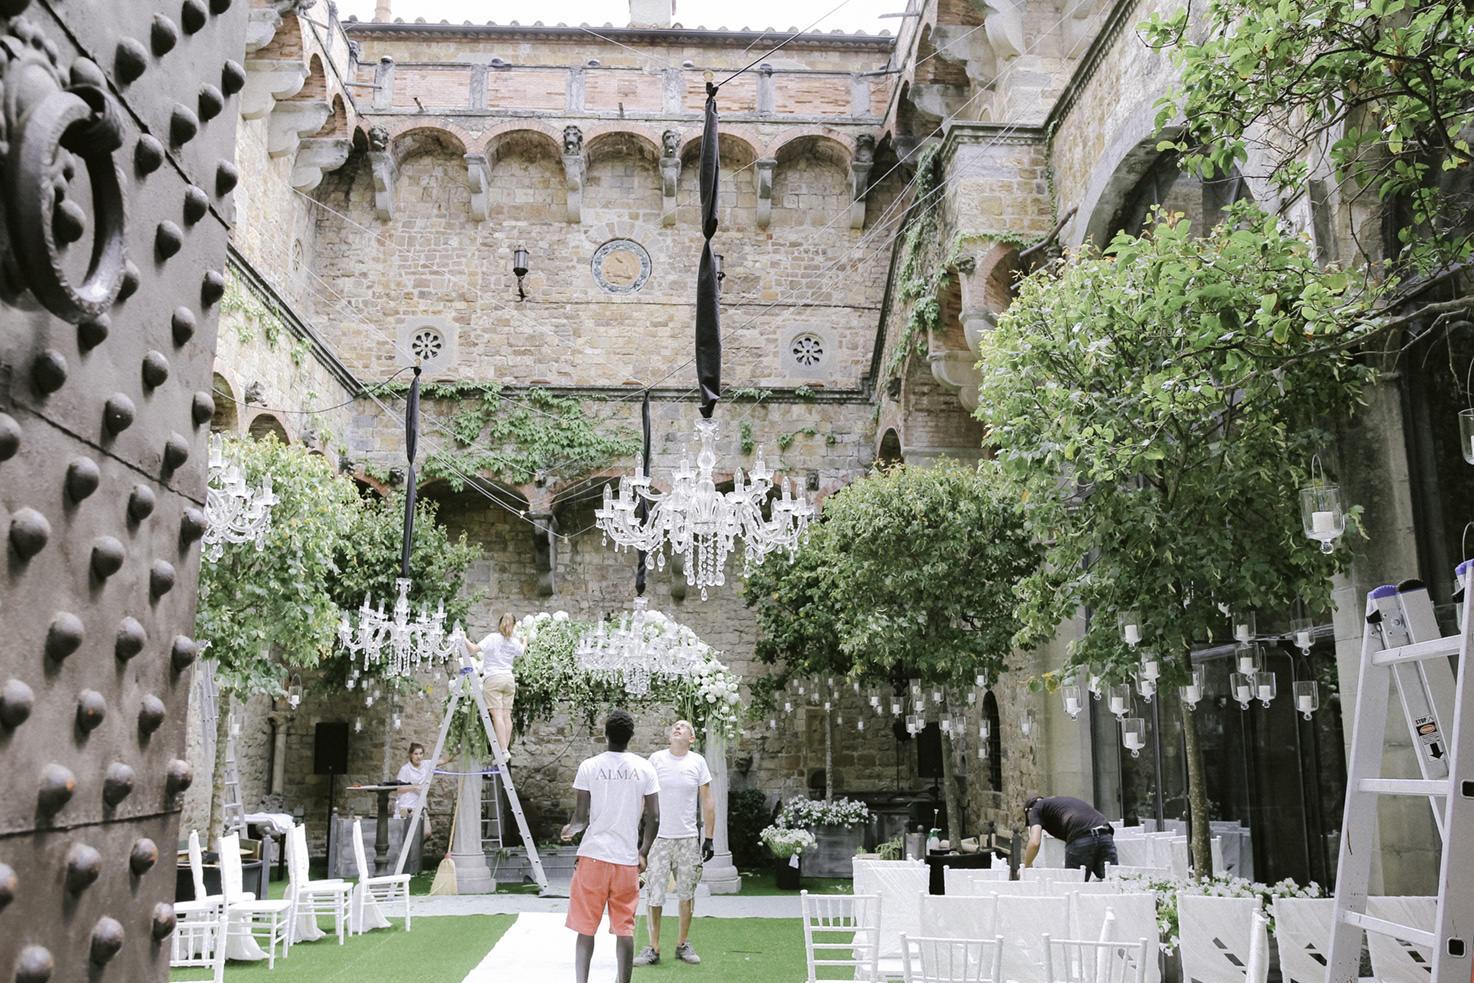 Flower set up for wedding ceremony